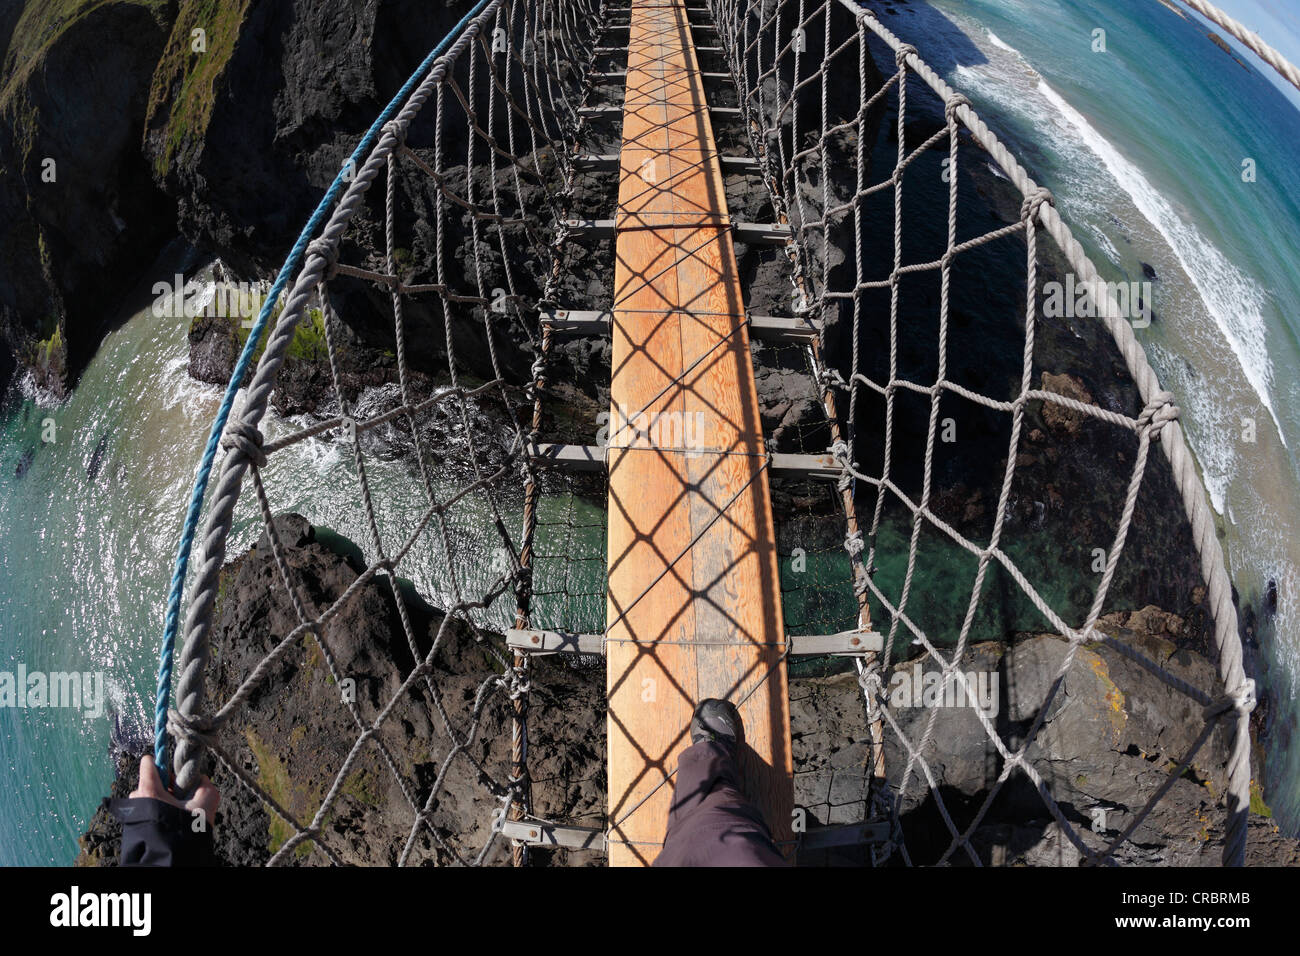 Carrick-a-Reed Rope Bridge, County Antrim, Northern Ireland, United Kingdom, Europe - Stock Image